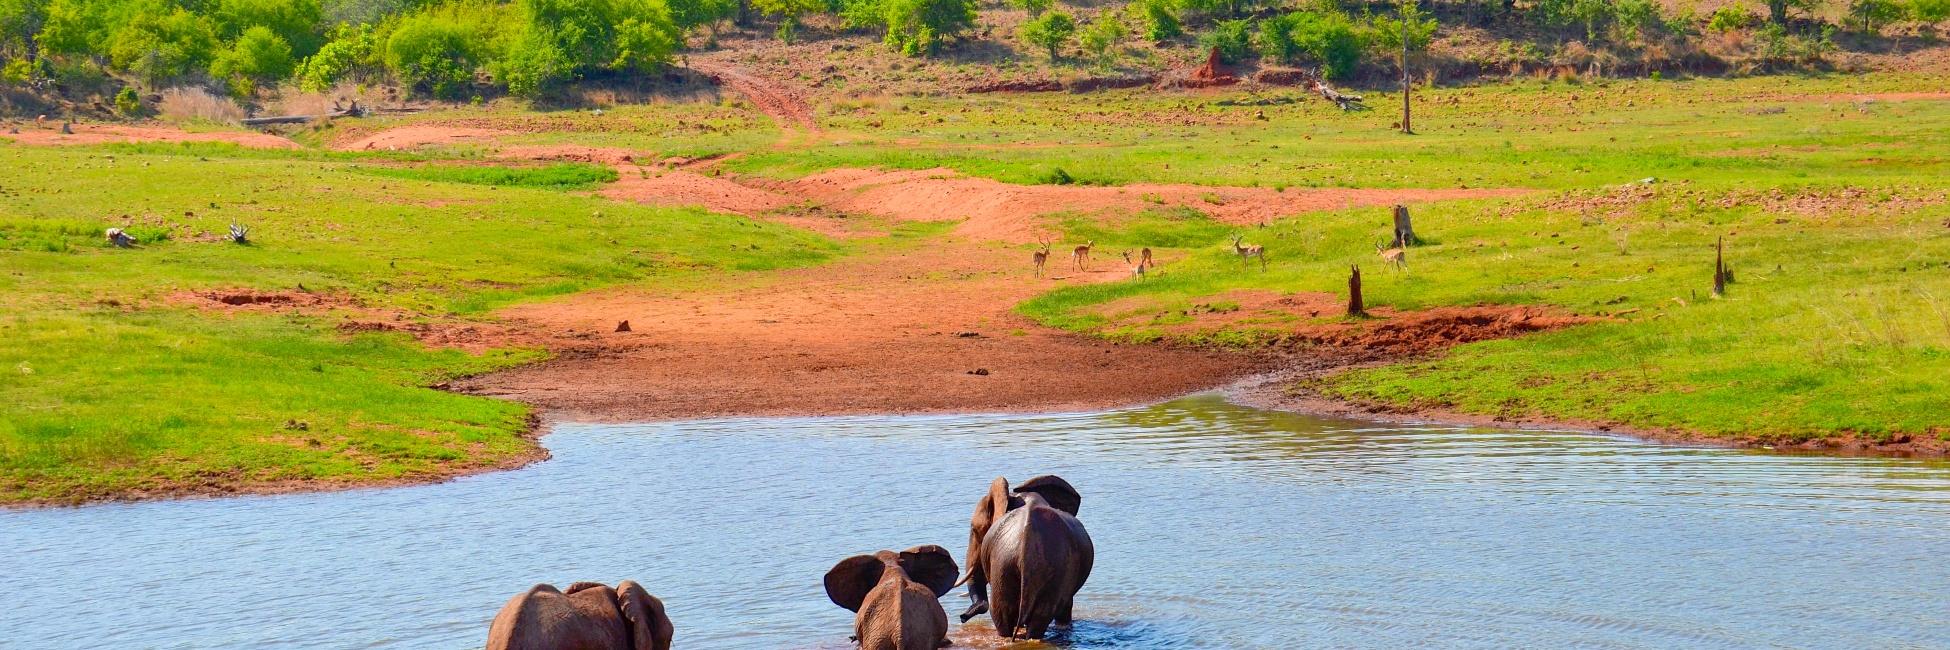 Safari au lac Kariba en Afrique